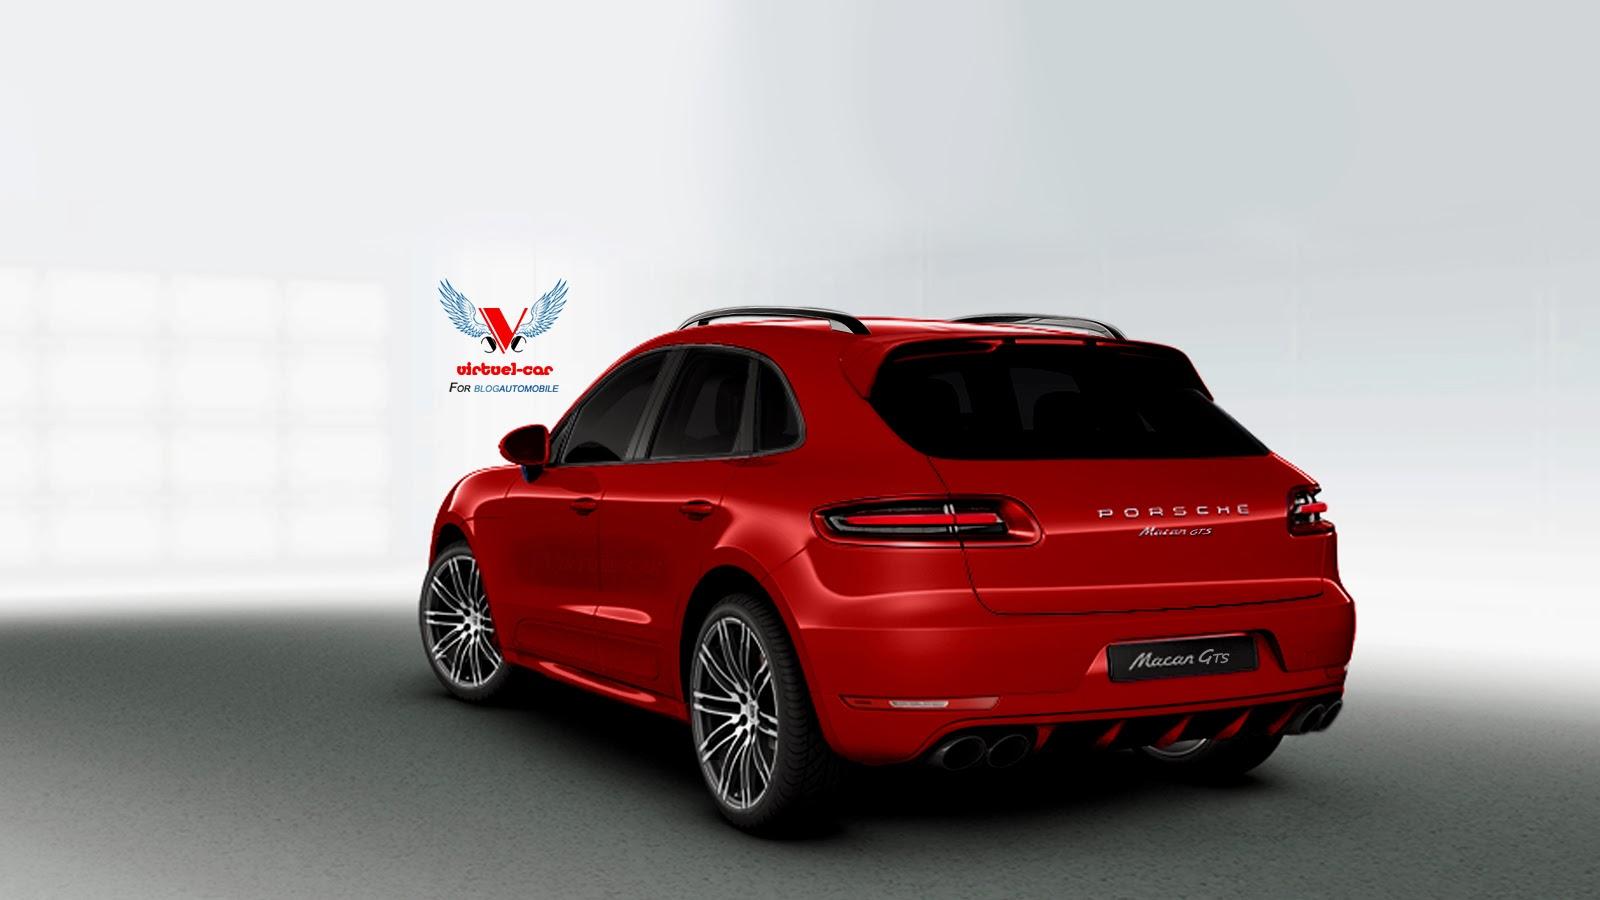 Porsche Macan Gts Rendered In Red Autoevolution